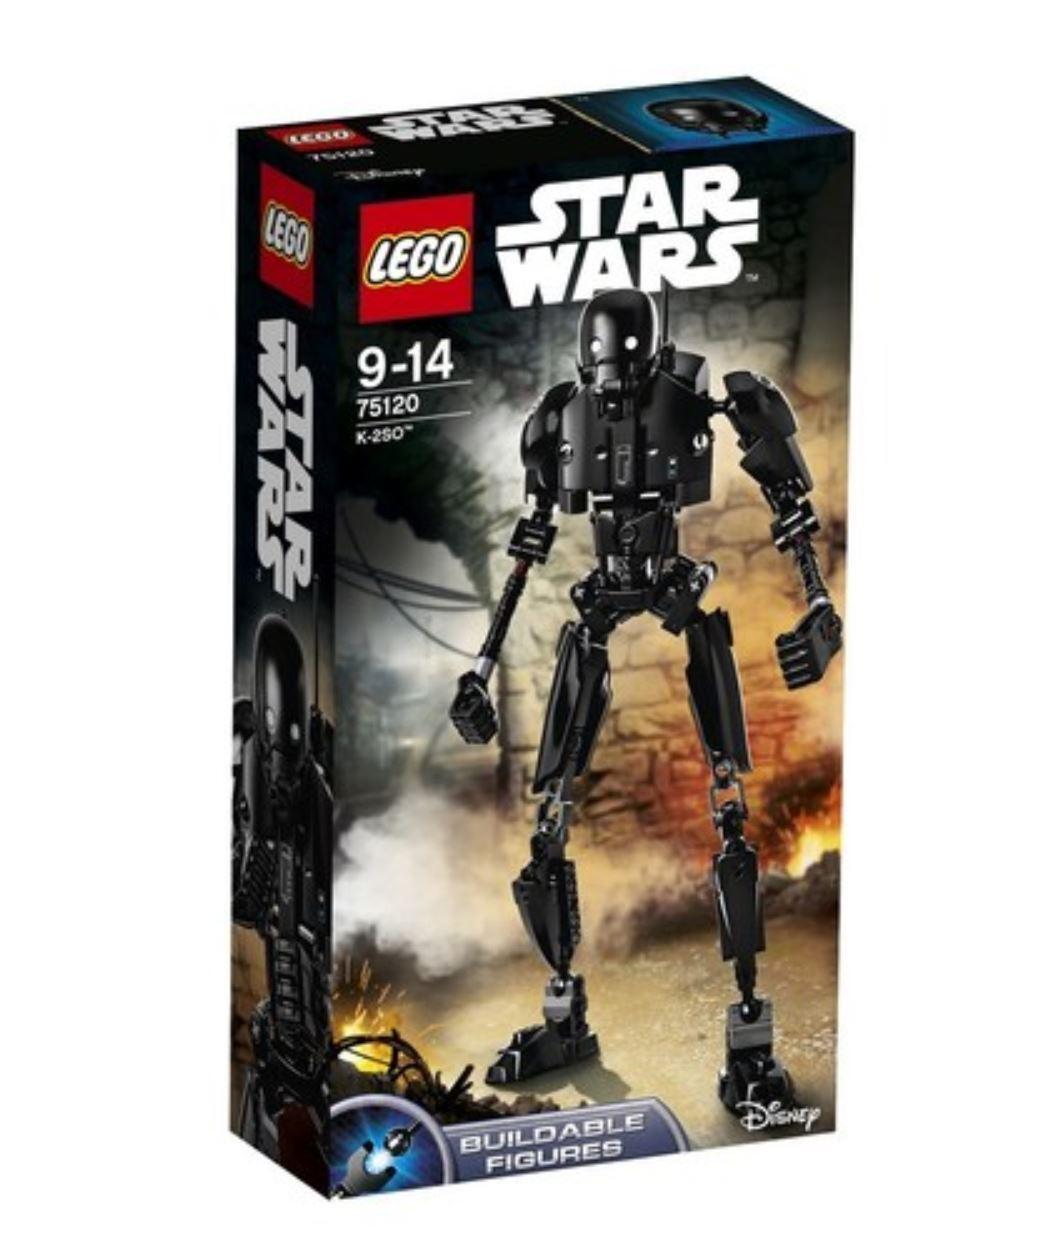 [LEGO] STARWARS K-2SO™ 75120 2016 Version Free Shipping